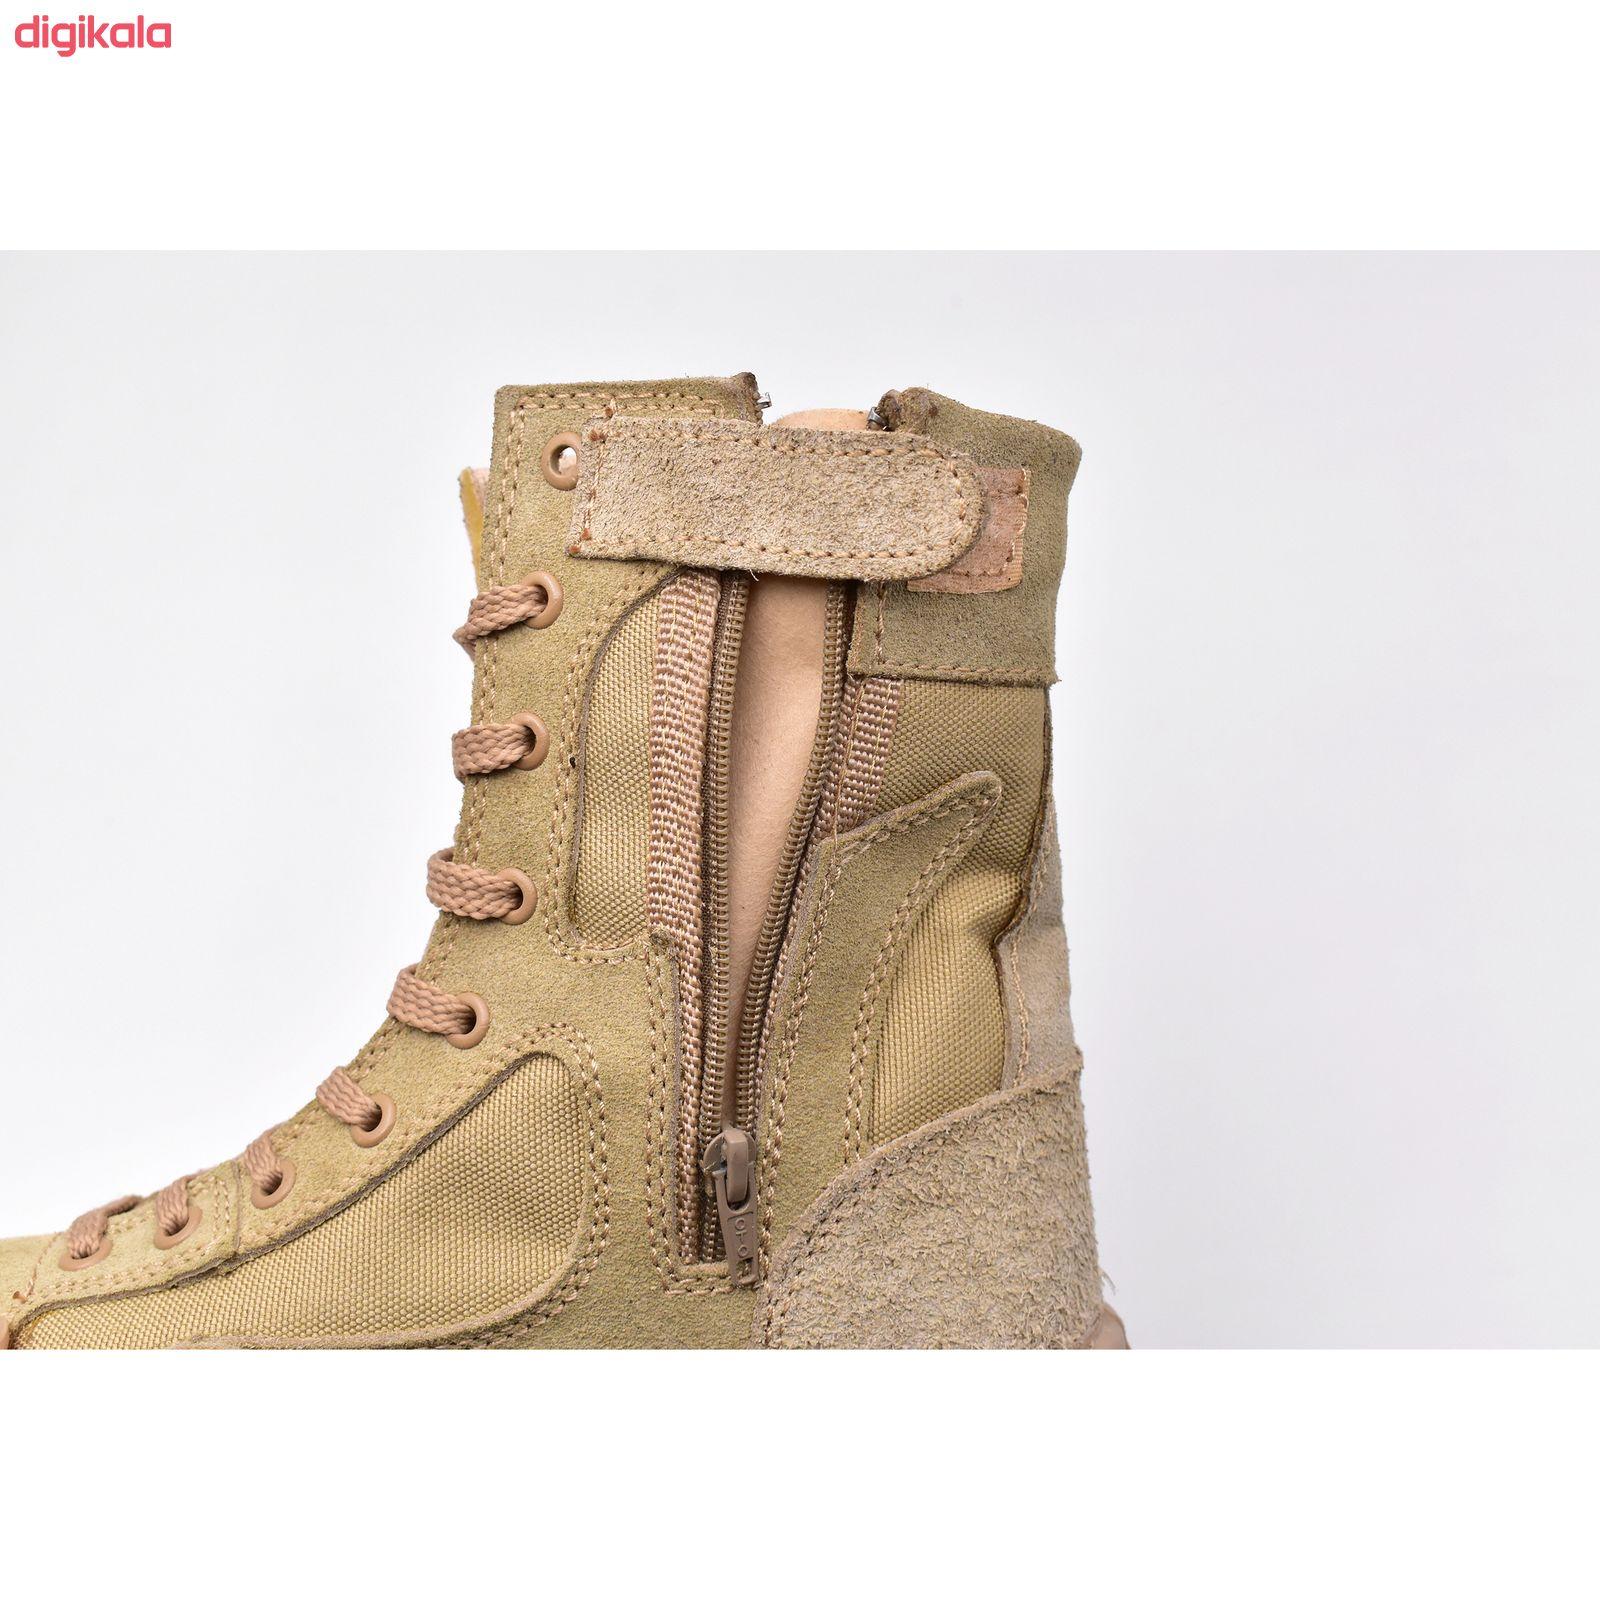 کفش کوهنوردی مردانه مدل Razm کد 8485 main 1 3